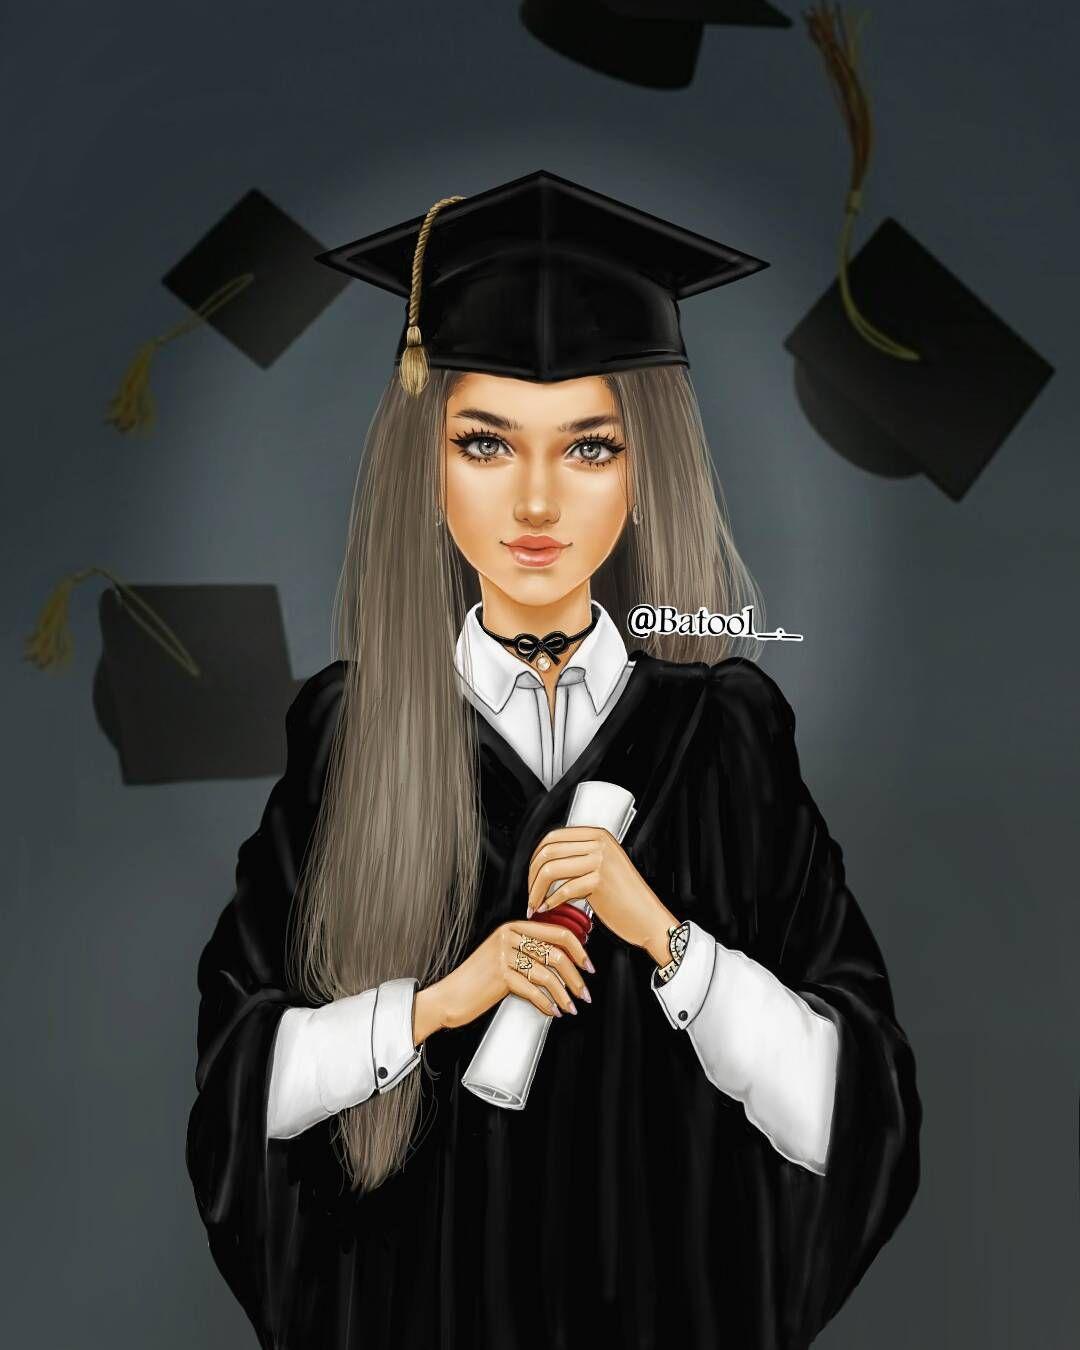 1 597 Likes 64 Comments Vatssℓ Kuwait Batool On Instagram ياسلام الله على اللي بفرحه تخرجت وابتدات صفحه Girly M Girls Cartoon Art Cute Girl Drawing